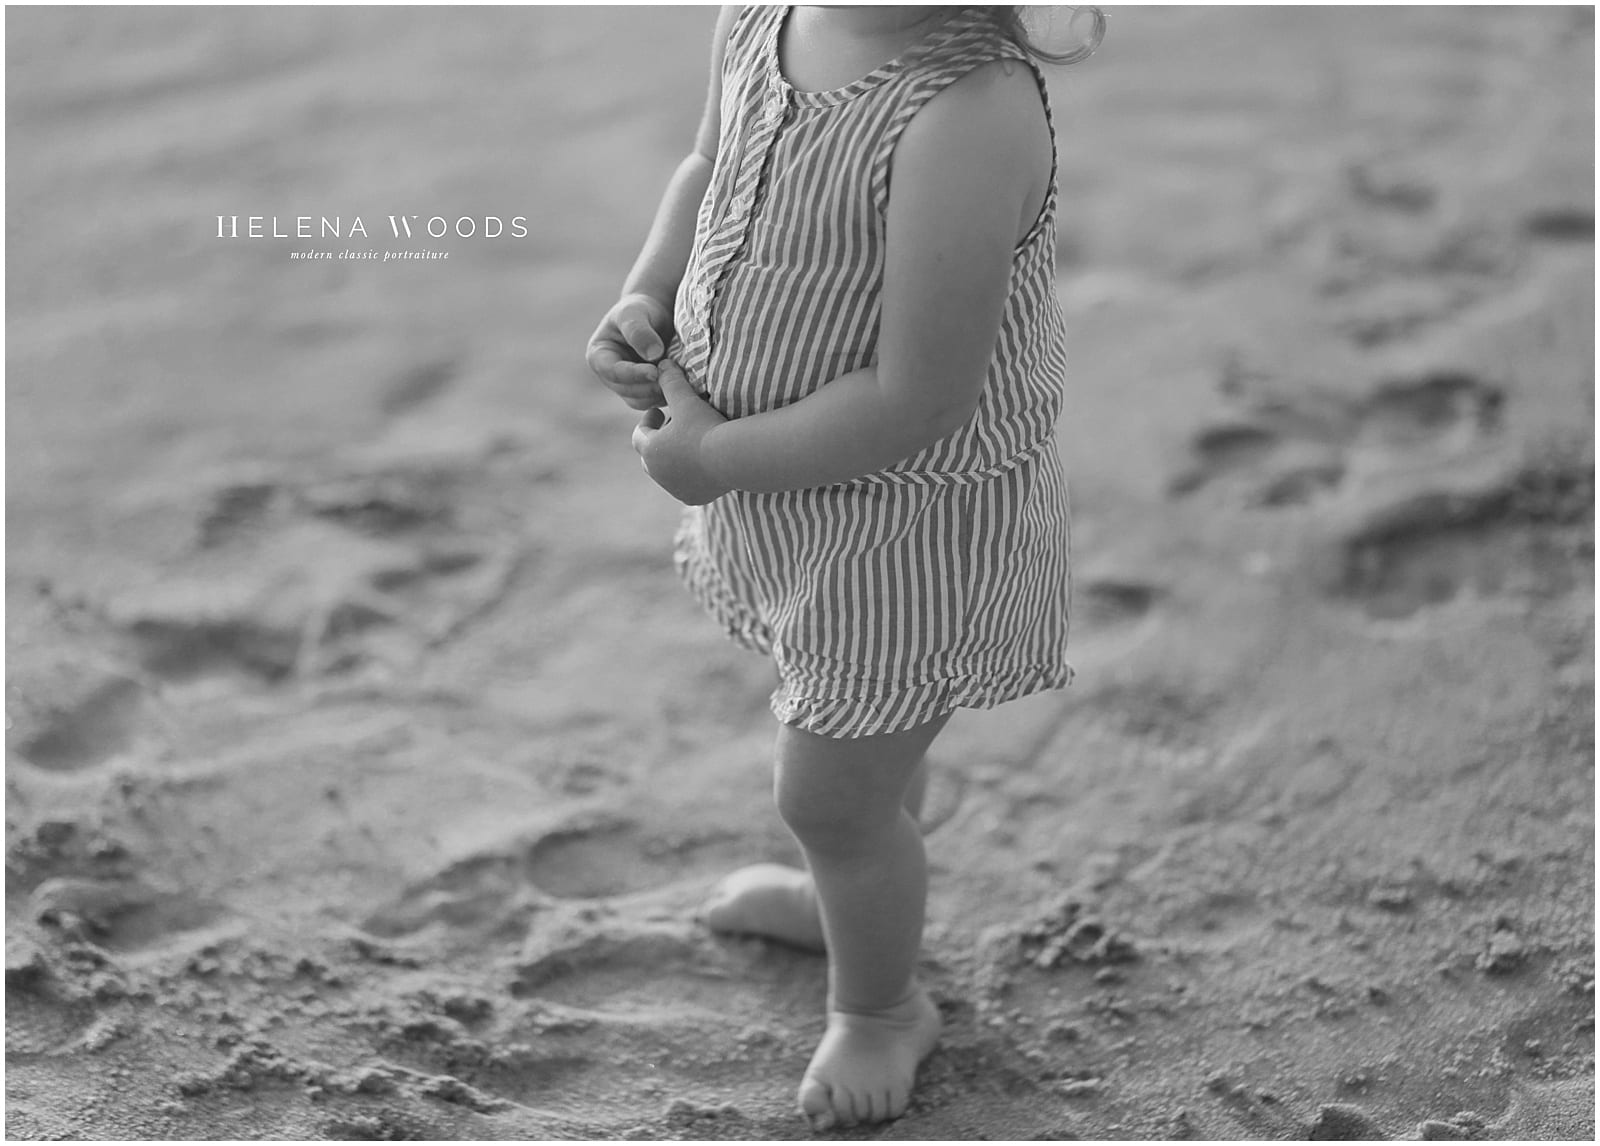 Helena Woods Connecticut Greenwich New york City Manhattan Beach Photographer. Children's and Family beach photography, why photographing kids at the beach is the best.